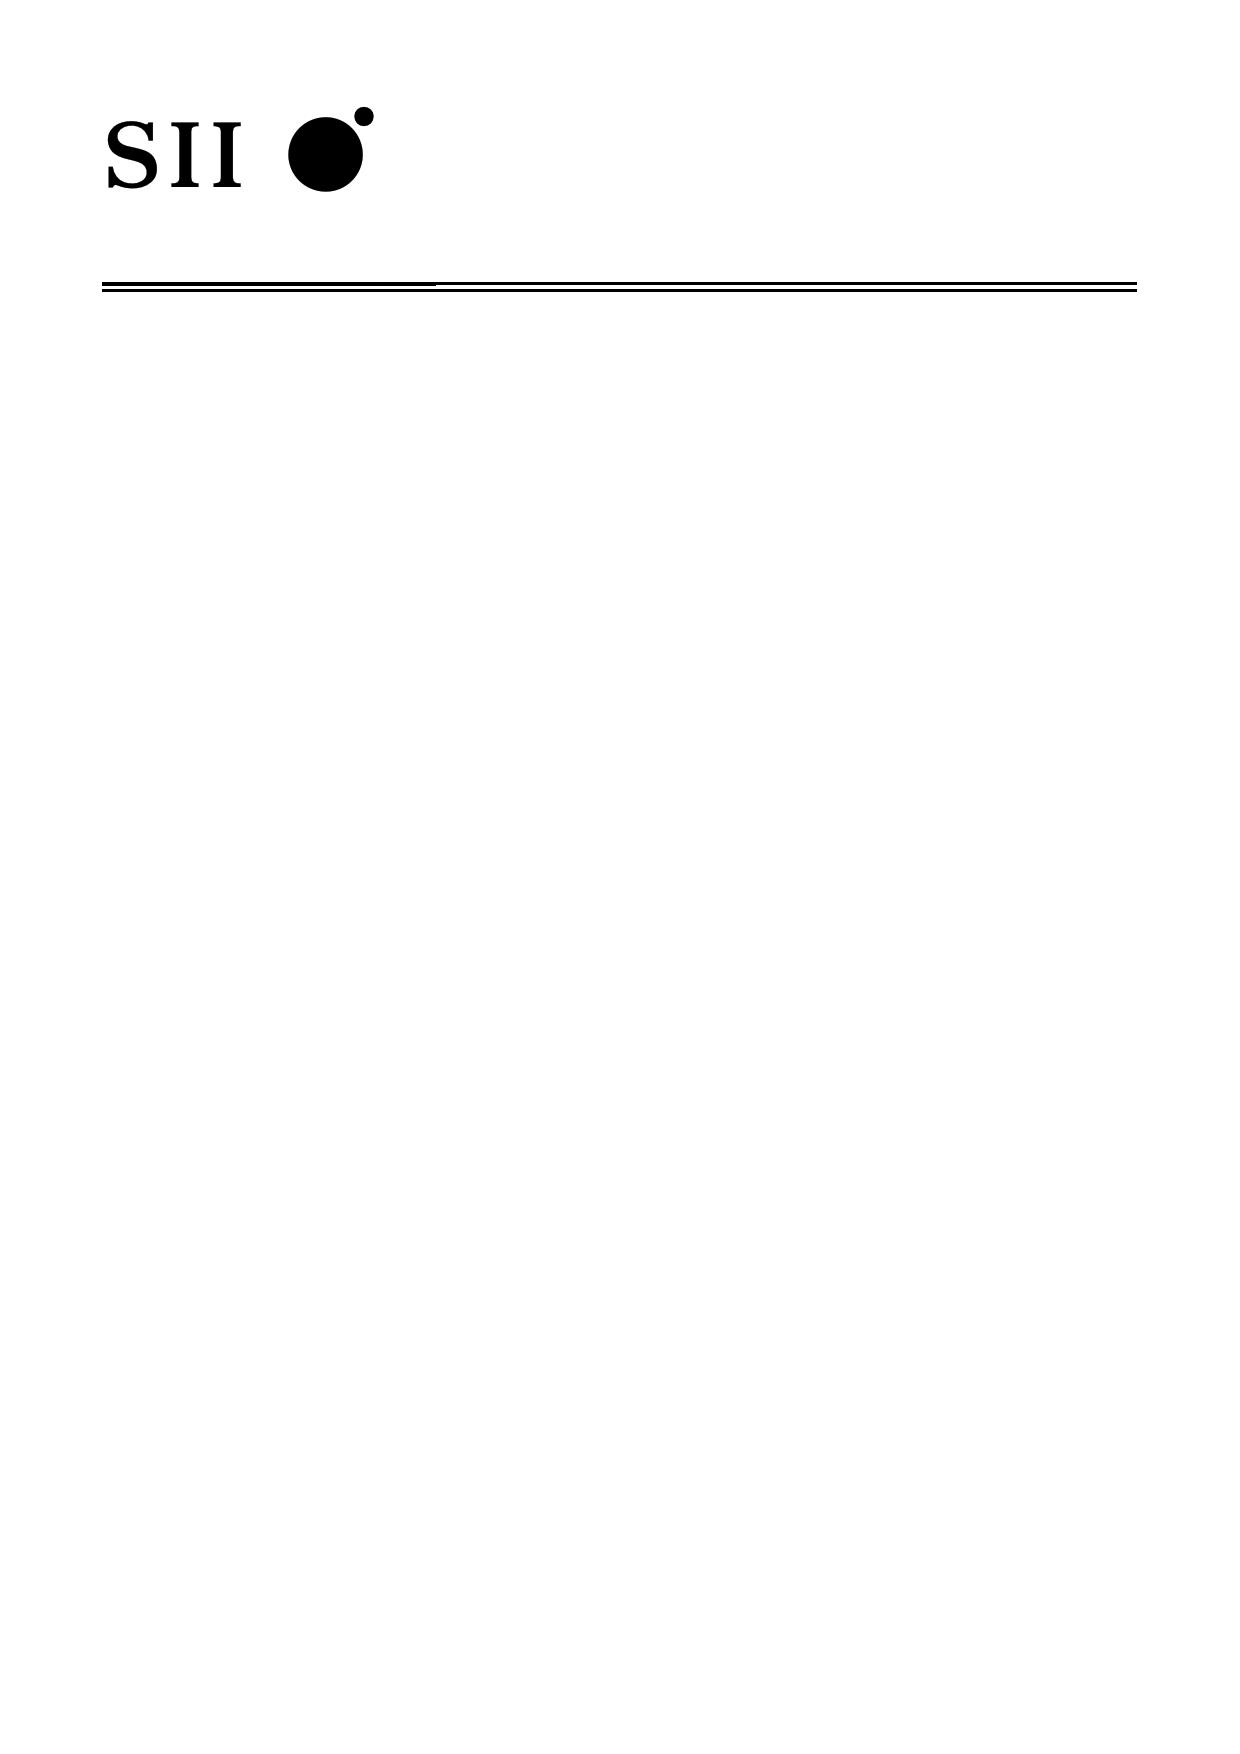 S-13D1 datasheet